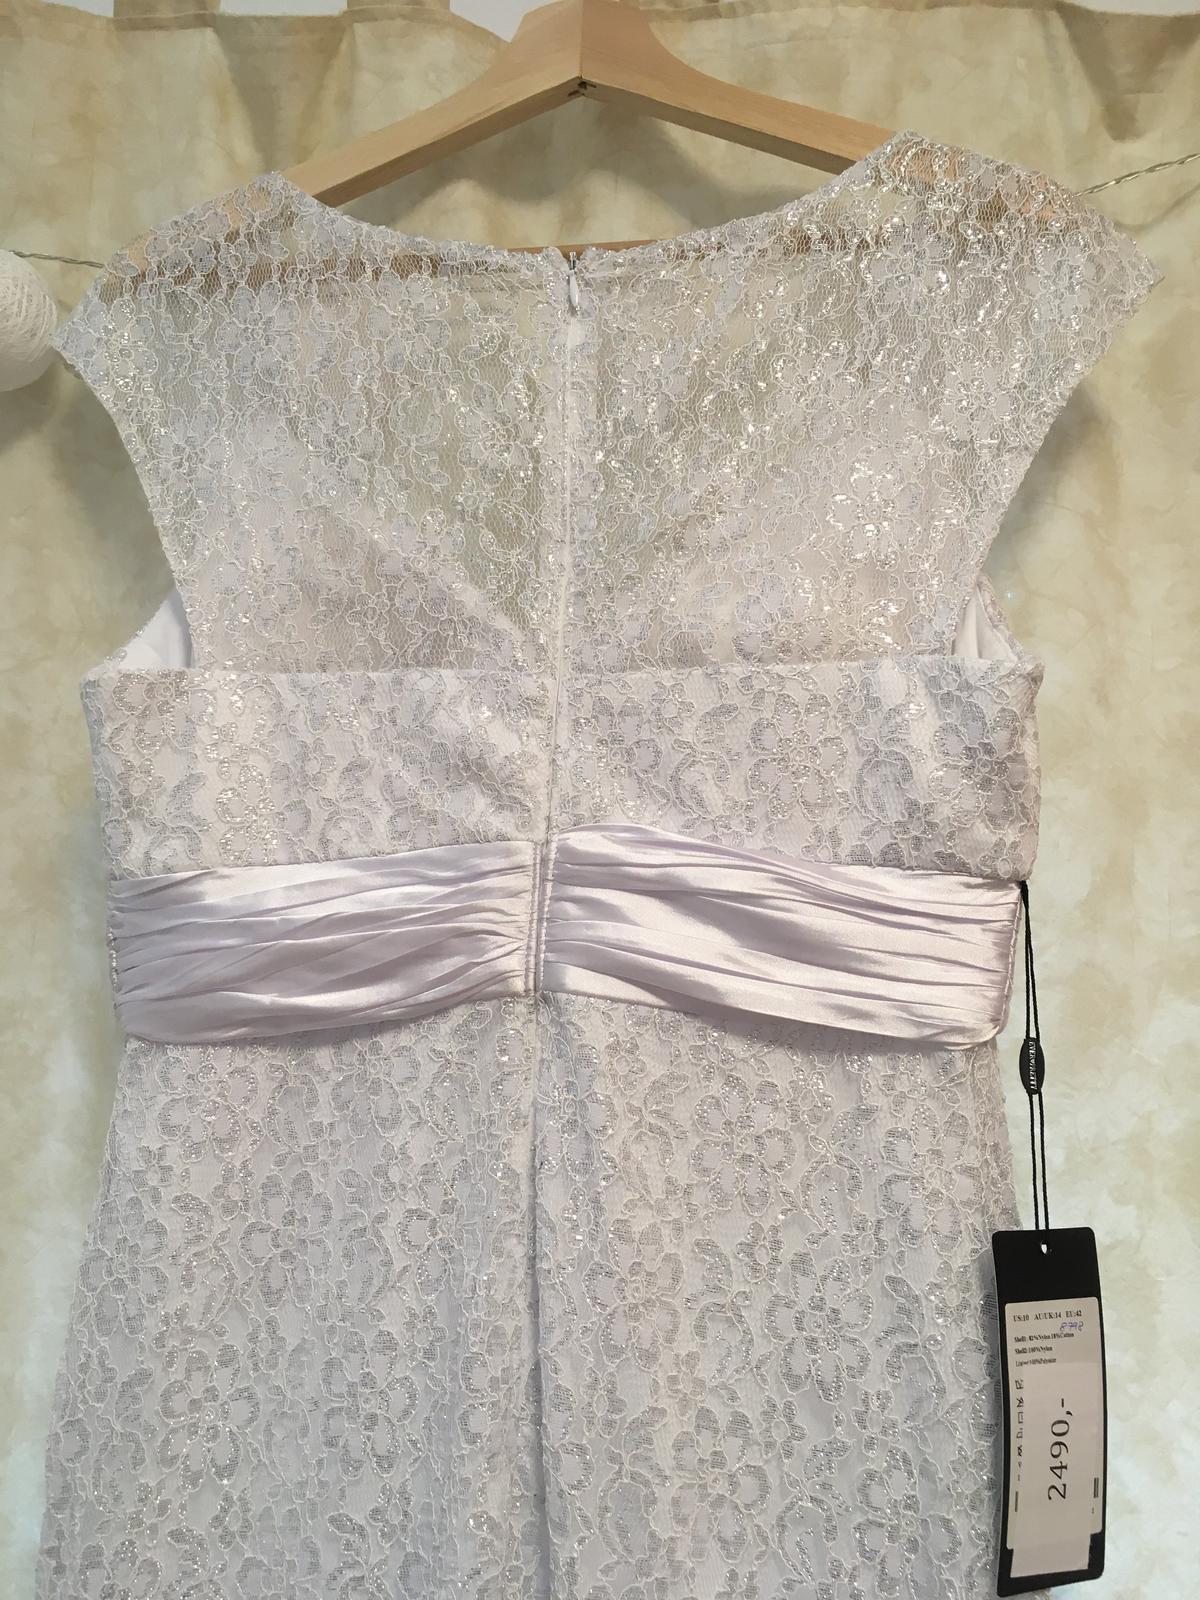 Krajkové šaty ePretty - Obrázek č. 3